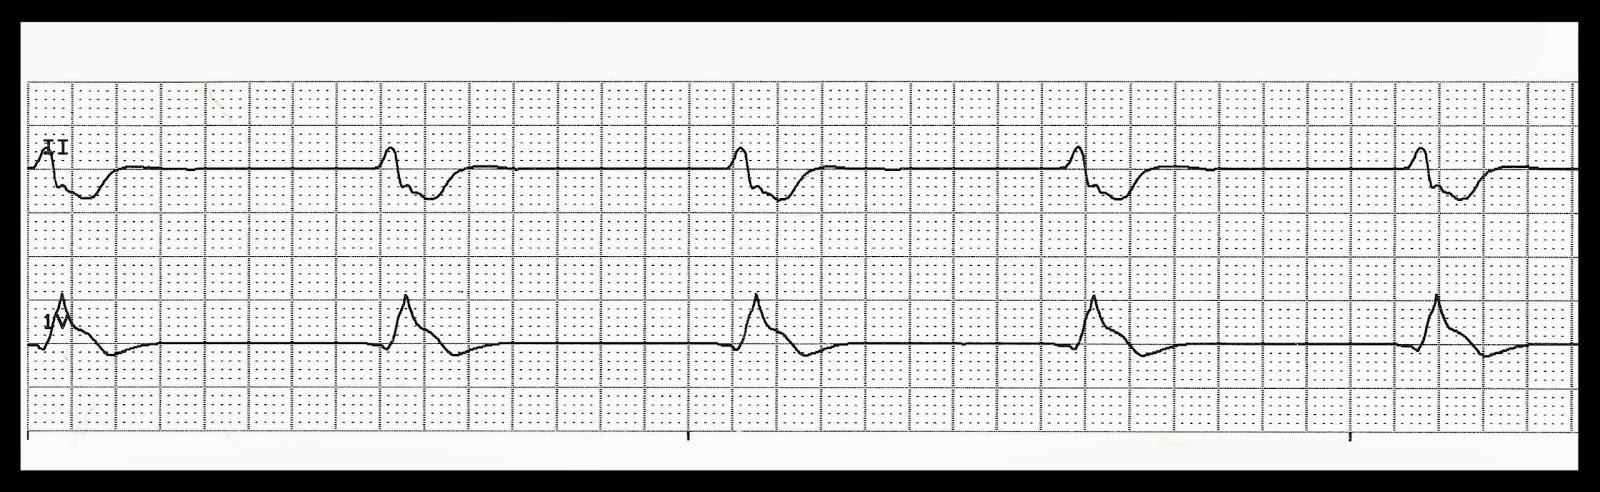 Fine Ventricular Tachycardia